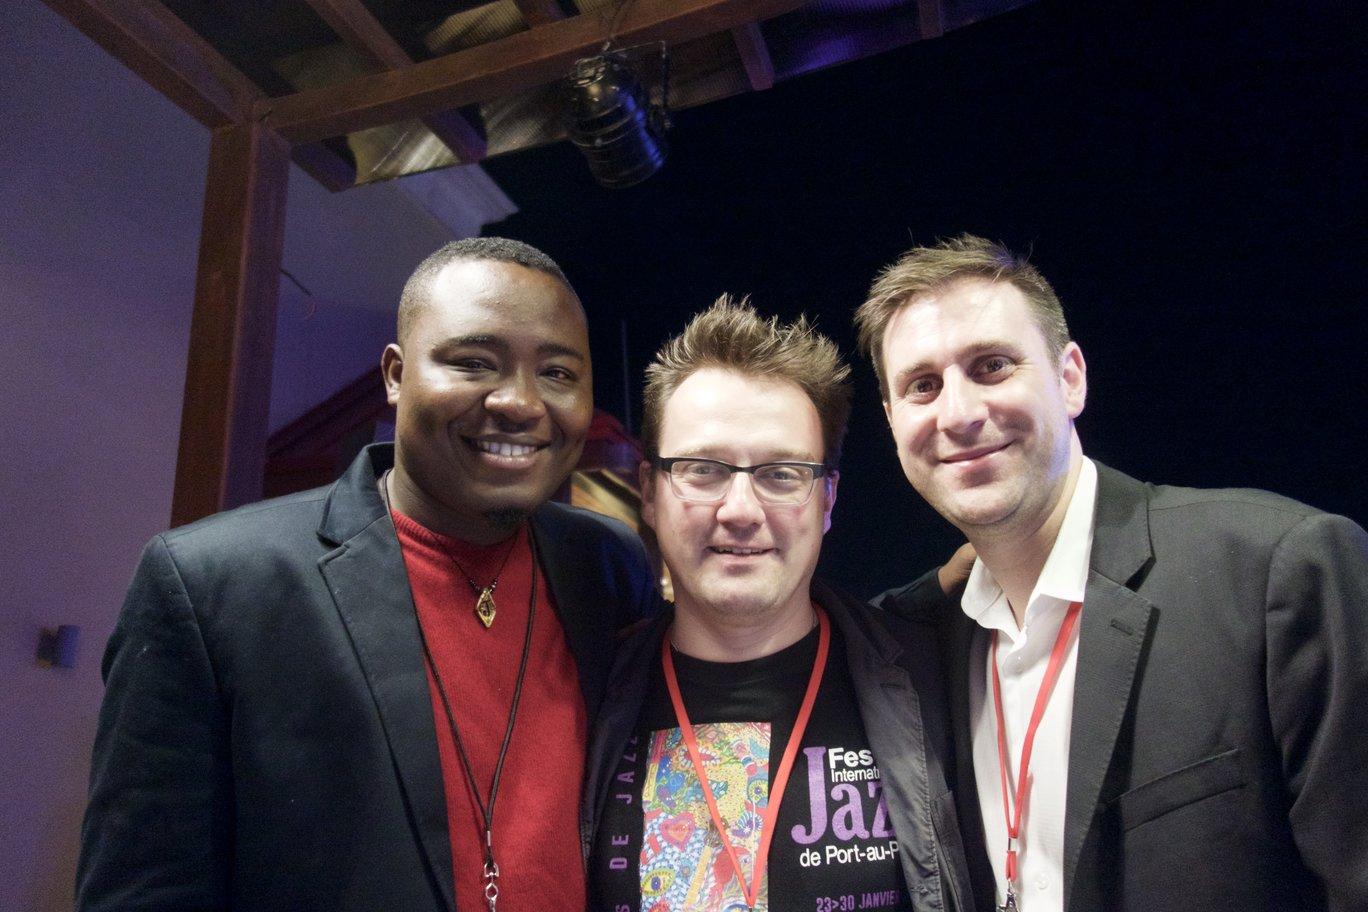 The Drummers in Haiti. Johnbern Thomas (Haiti), Markus Faller (Germany), Jim Doxas (Canada)